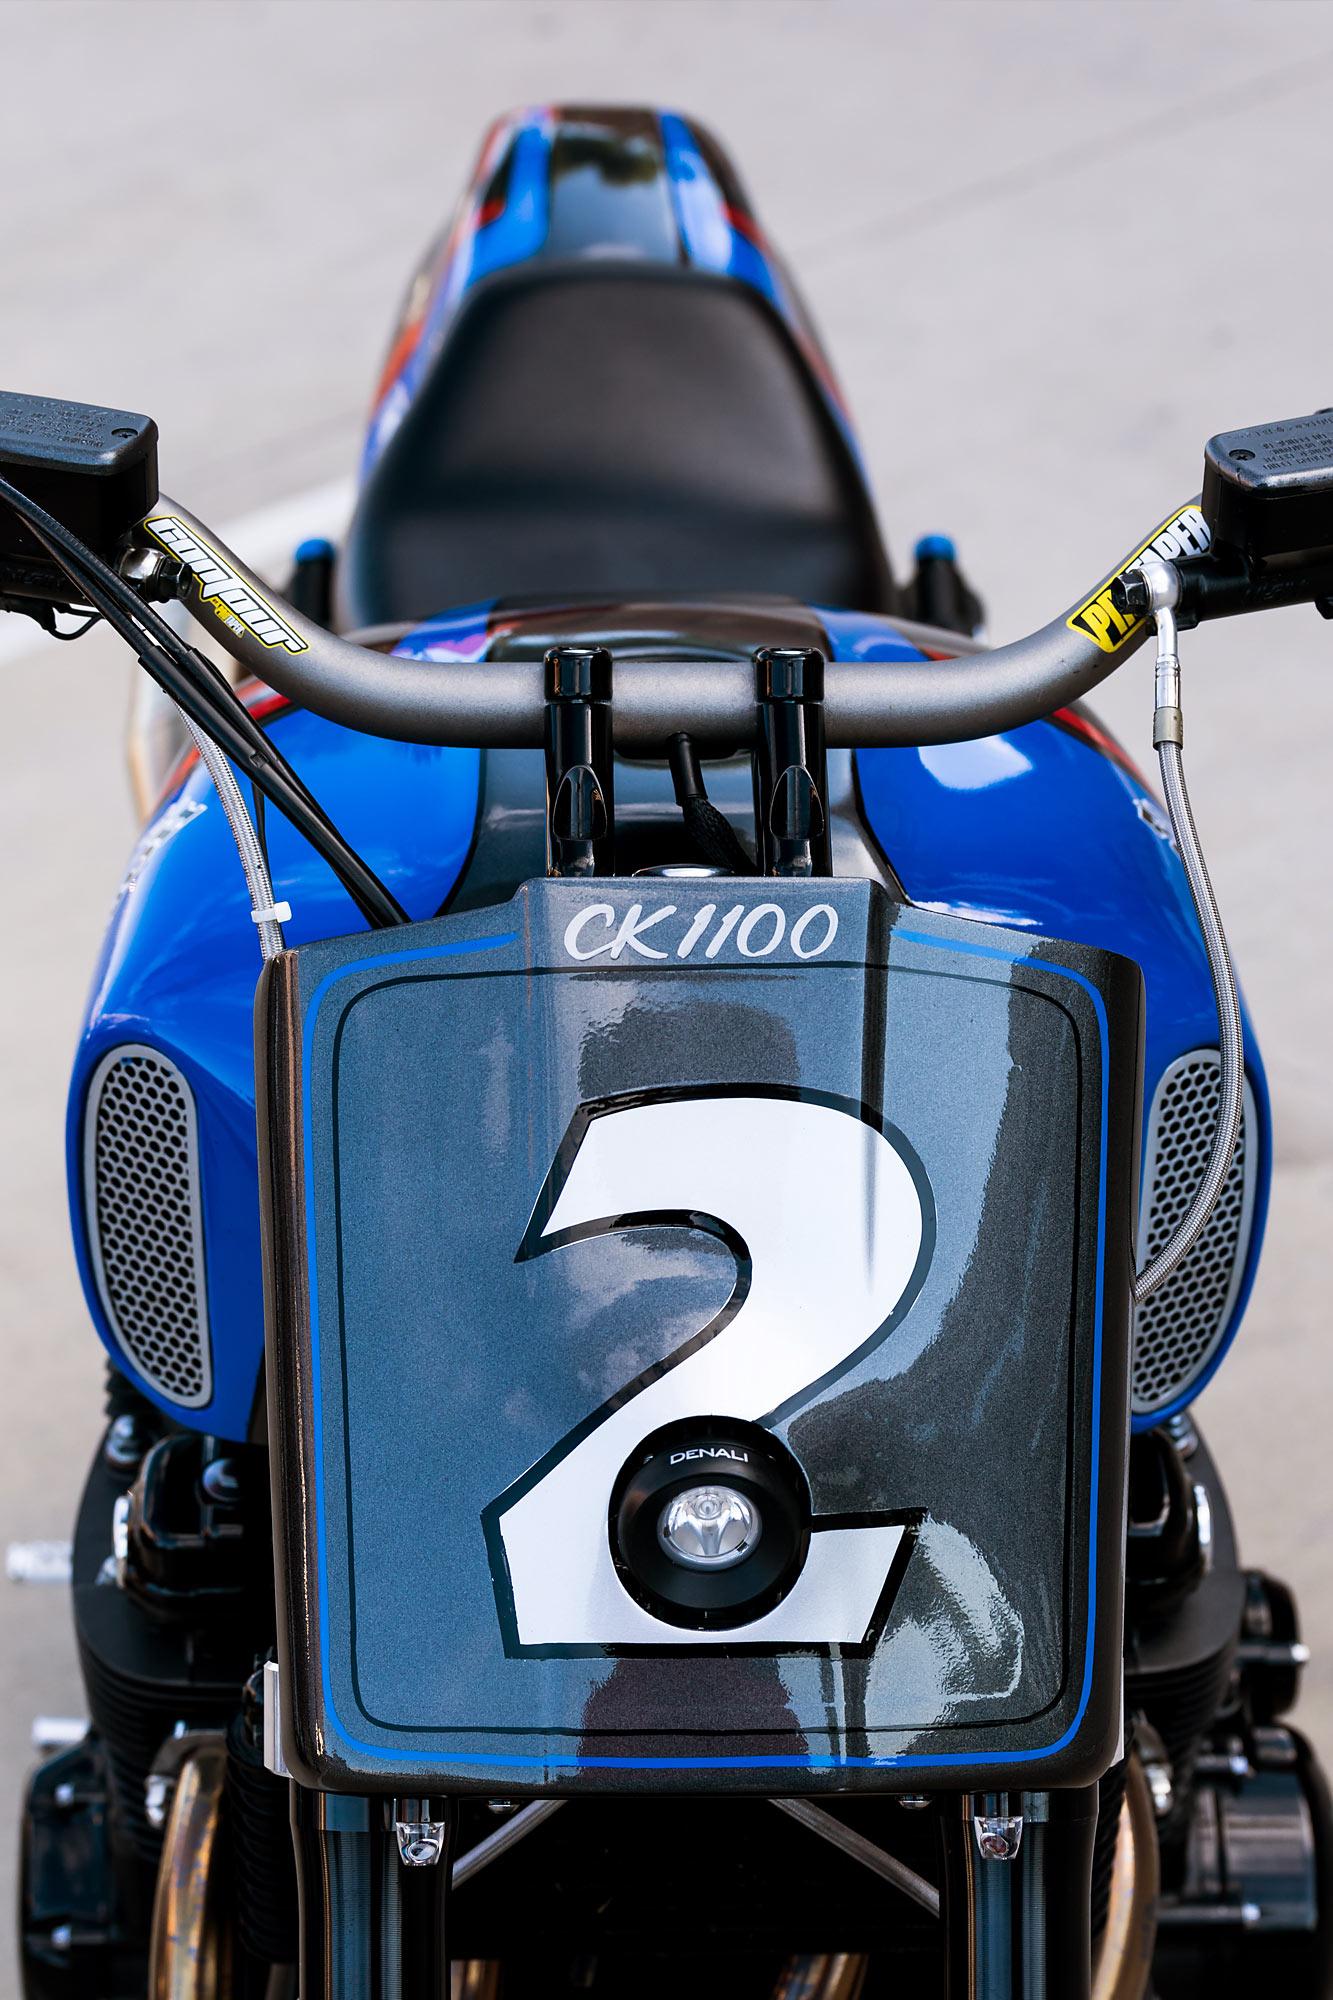 COLORADO CLIMBER  Chris Kent's Honda CB1100 Pikes Peak Racer